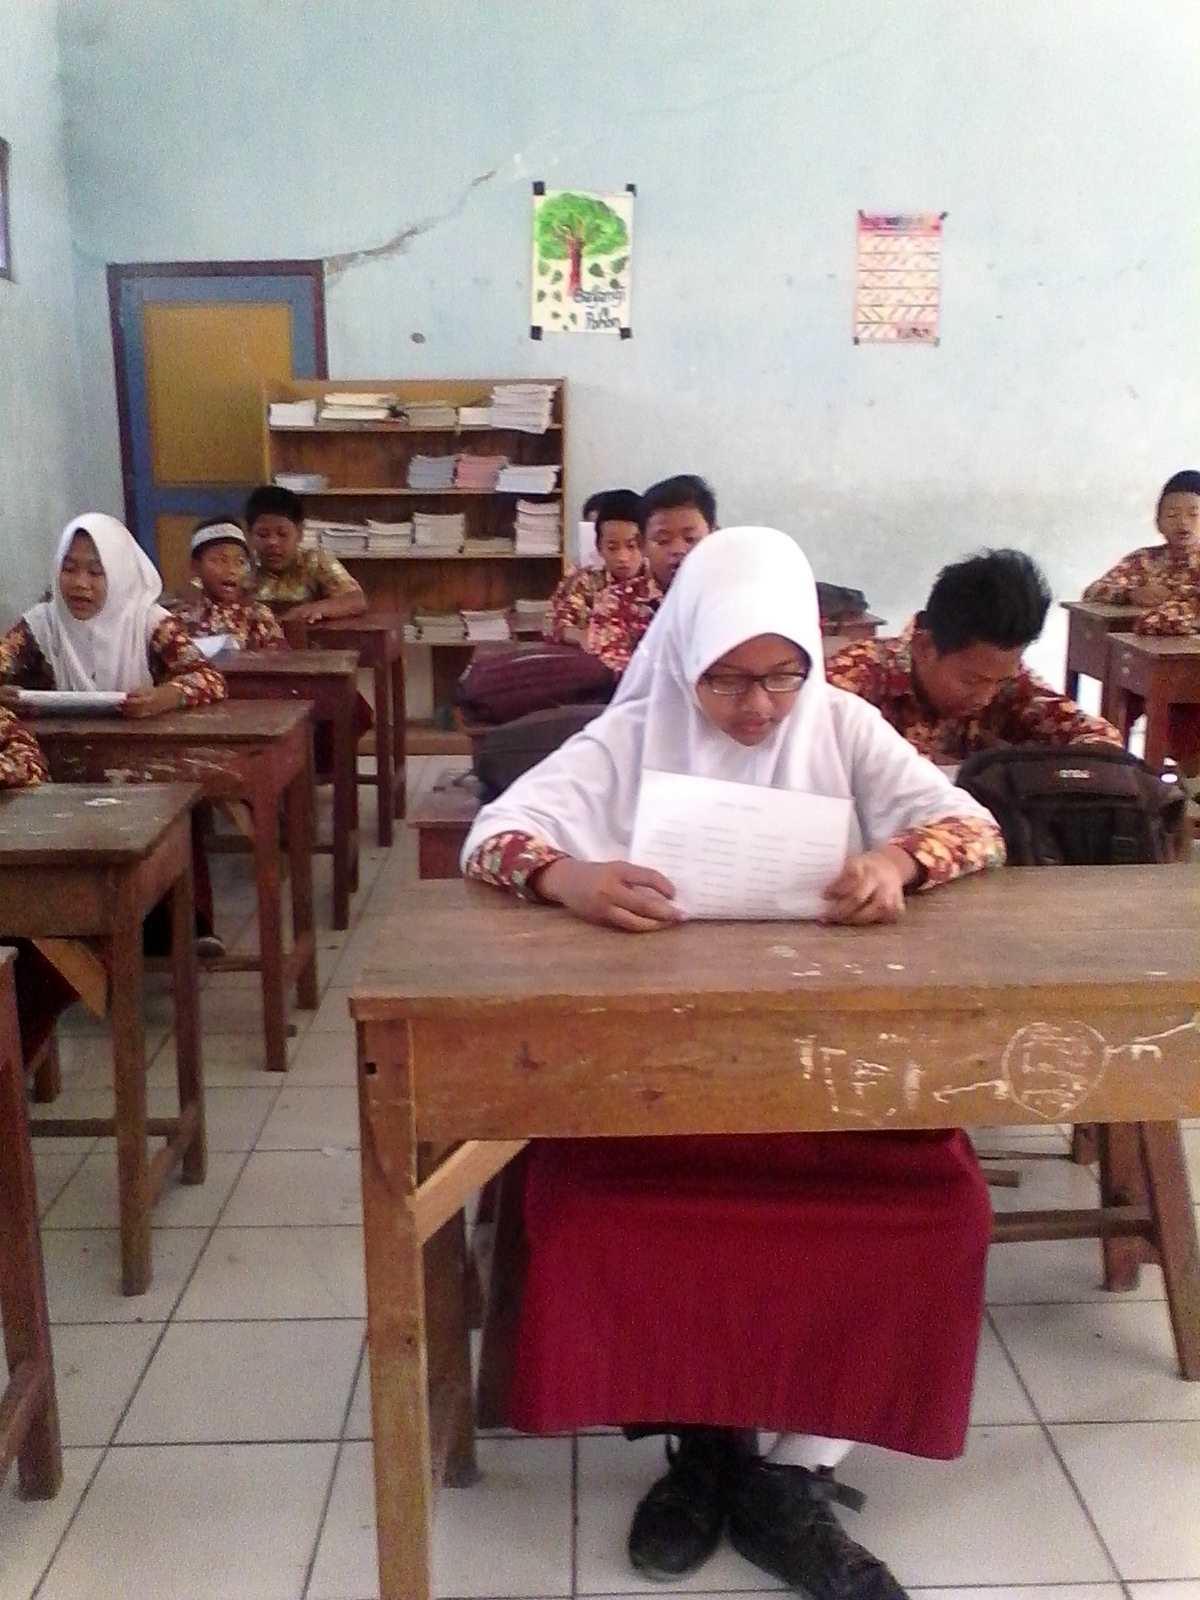 Download Soal Ulangan Harian Kelas 4 SD/MI Kurikulum 2013 Semester 1 Lengkap Kunci Jawaban